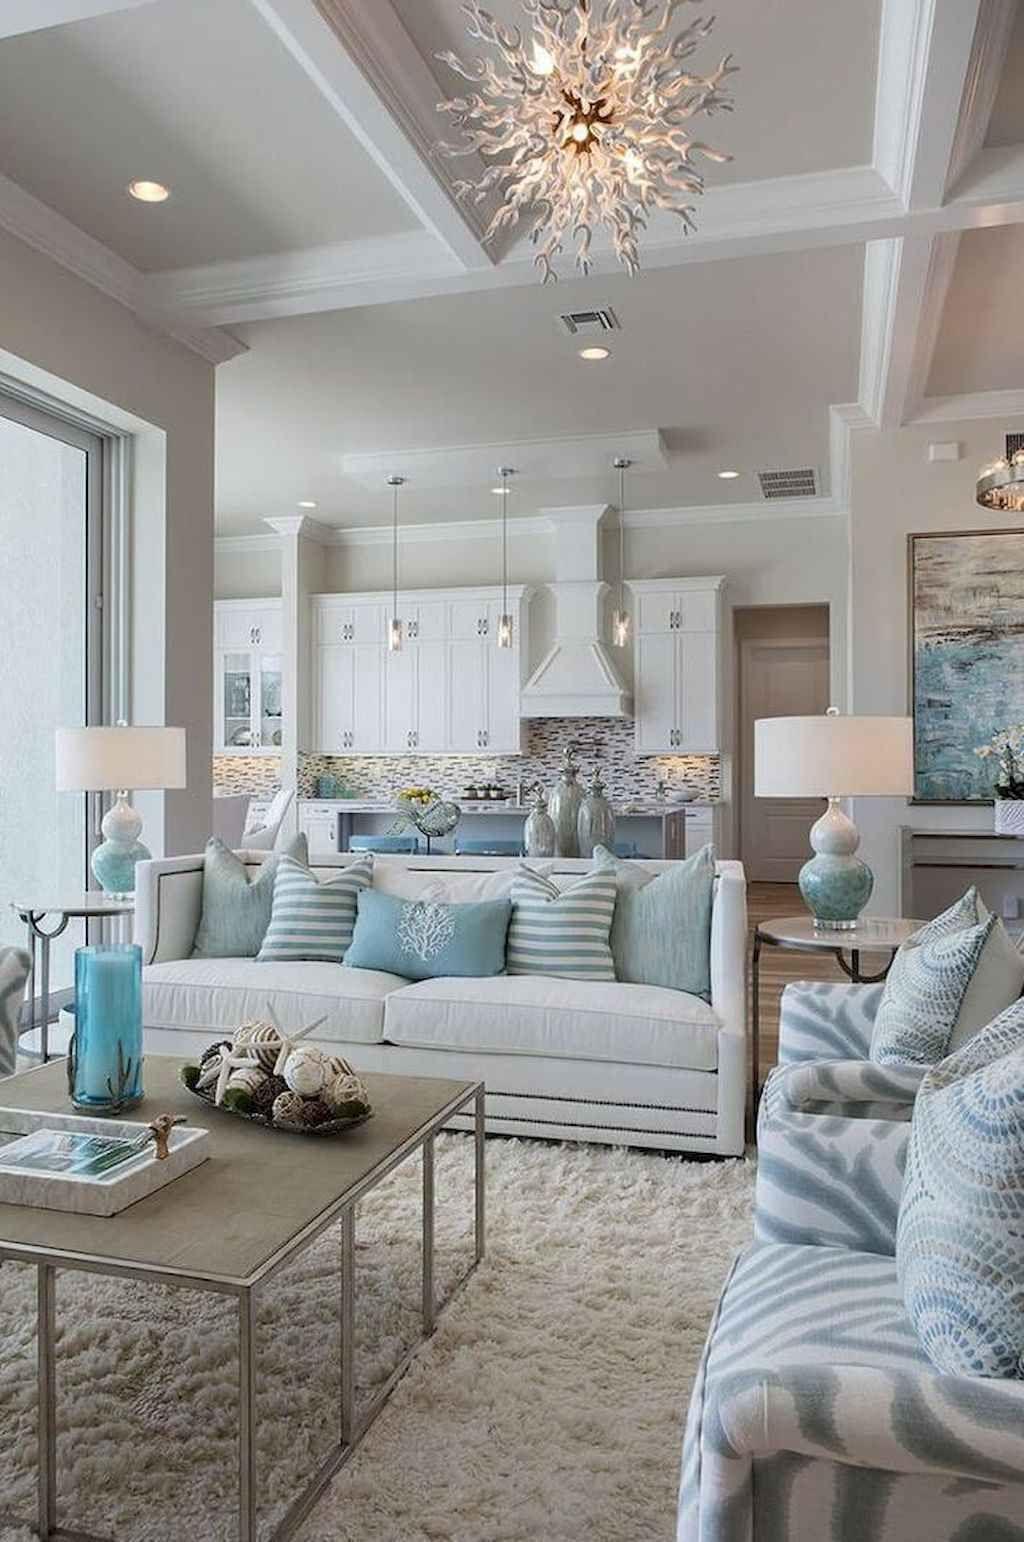 Rustic modern farmhouse living room decor ideas (12 | Farm ...